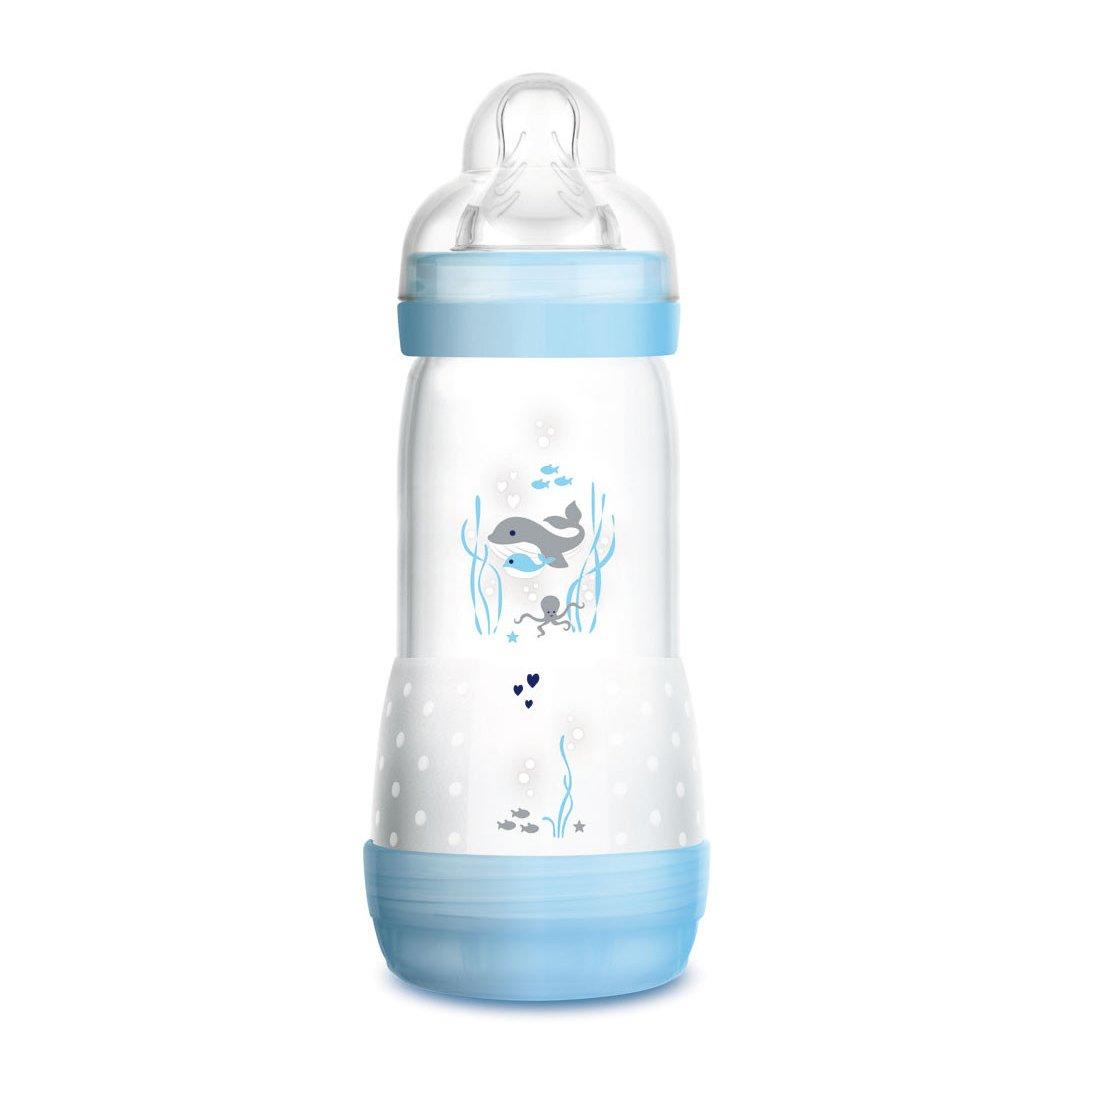 Mam Easy Start™ Anti-Colic 4+ Μηνών, Κωδ 356S Μπιμπερό Πολυπροπυλενίου με Θηλή Σιλικόνης & Σύστημα Κατά των Κολικών 320ml – μπλέ